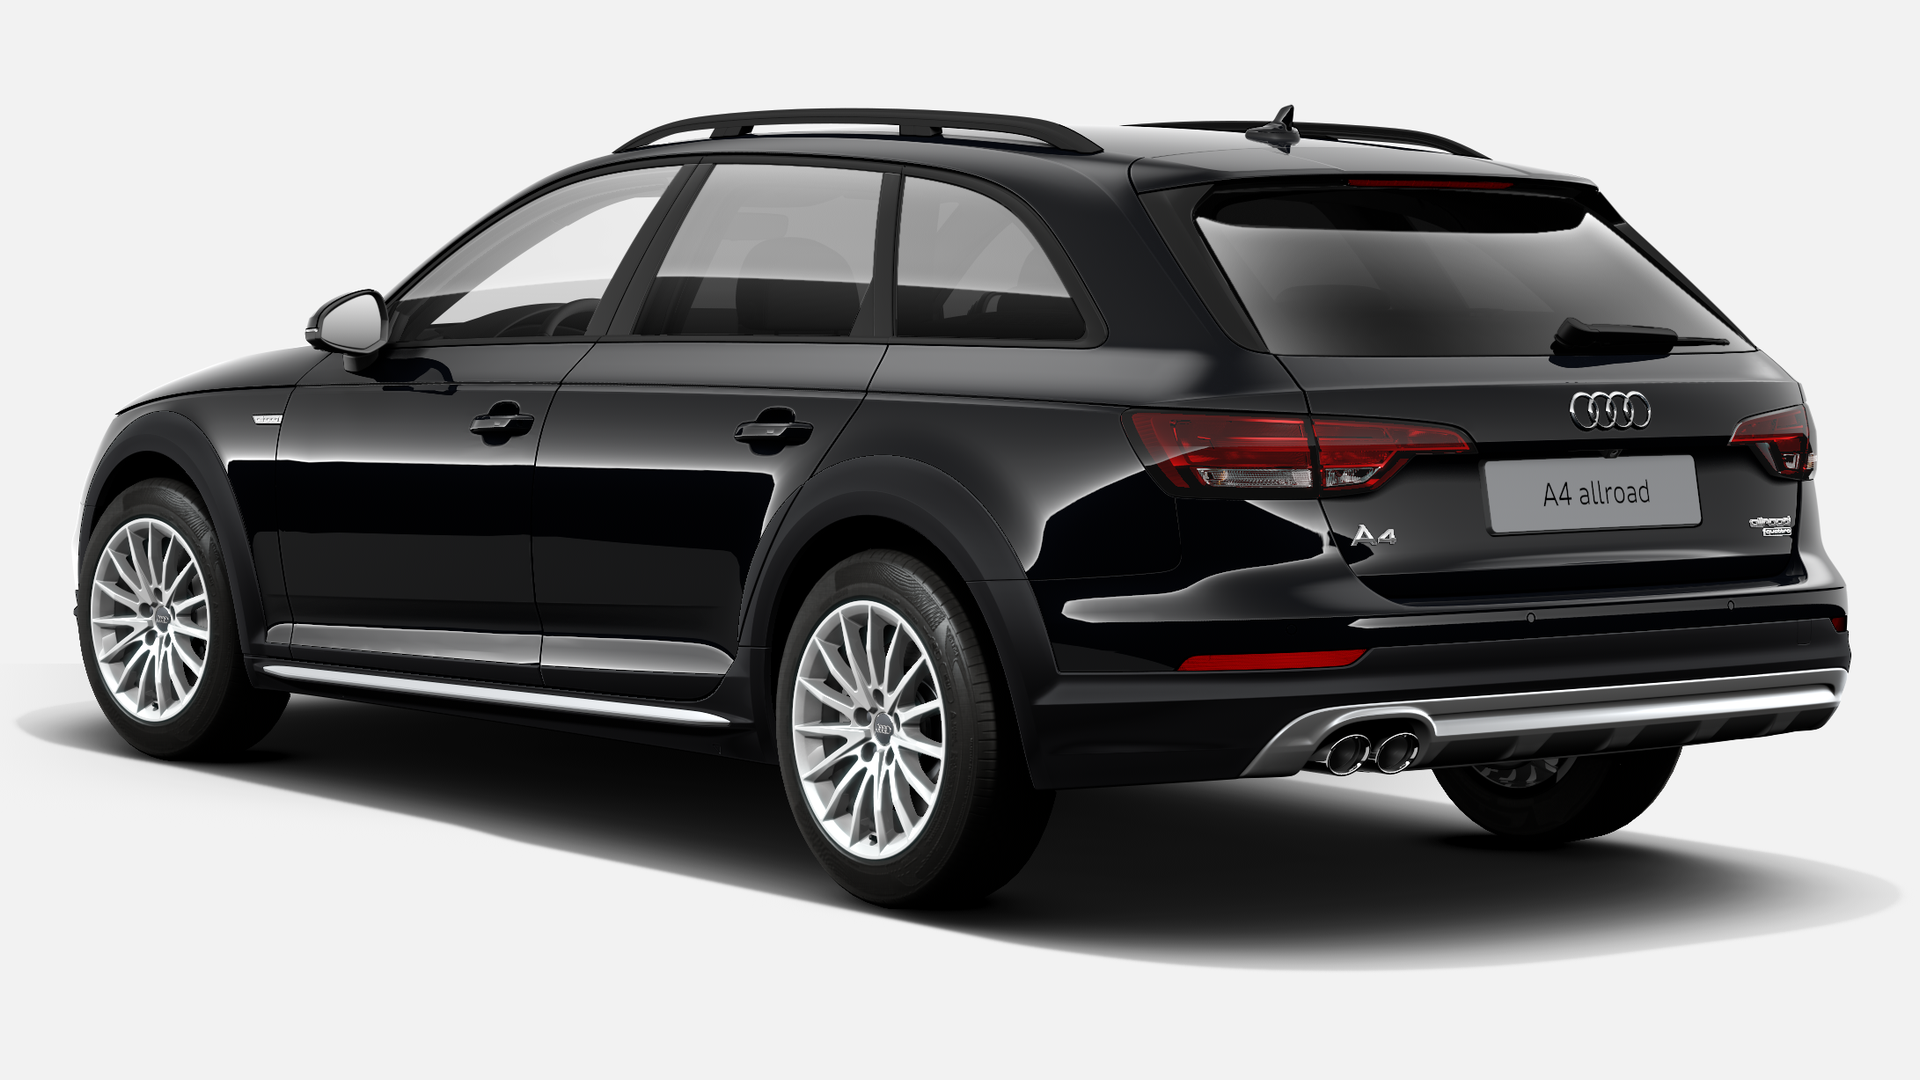 Vista Tres cuartos trasera izquierda de Audi A4 Allroad 2.0 TDI unlimited quattro S tronic 140 kW (190 CV)